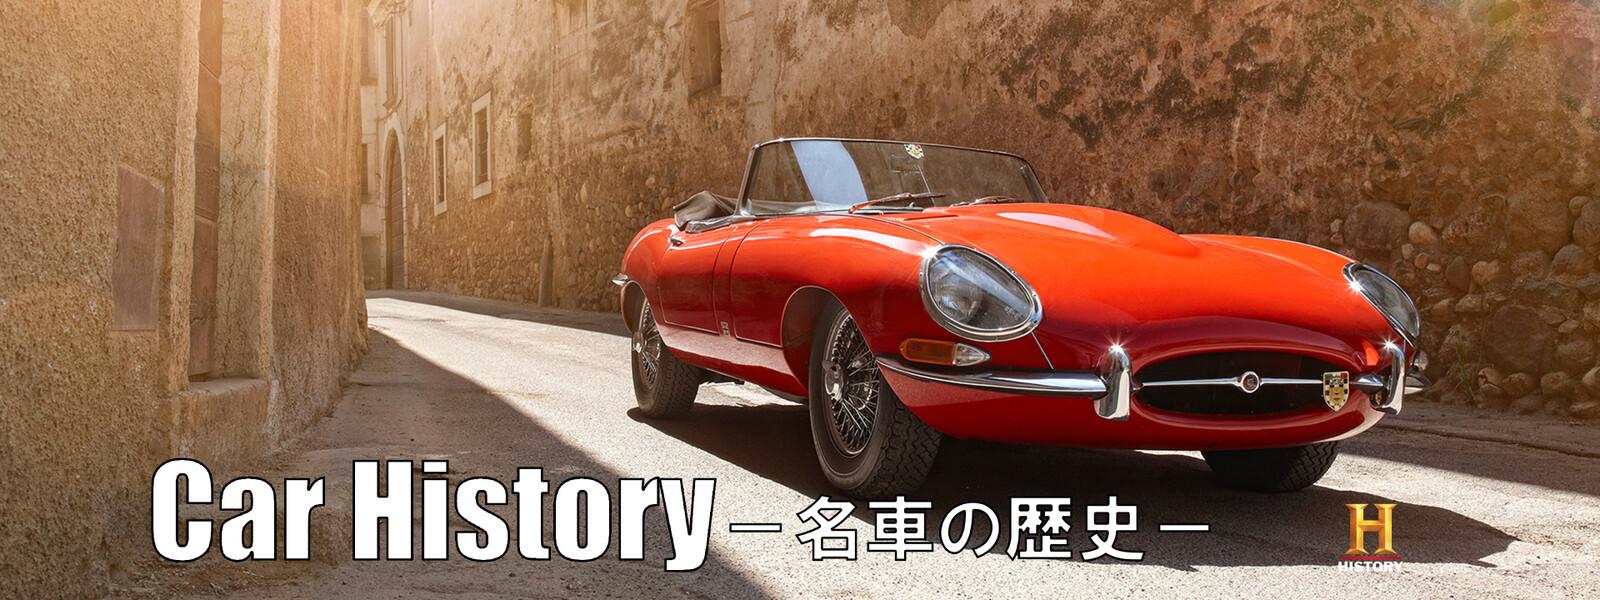 Car History -名車の歴史- 動画